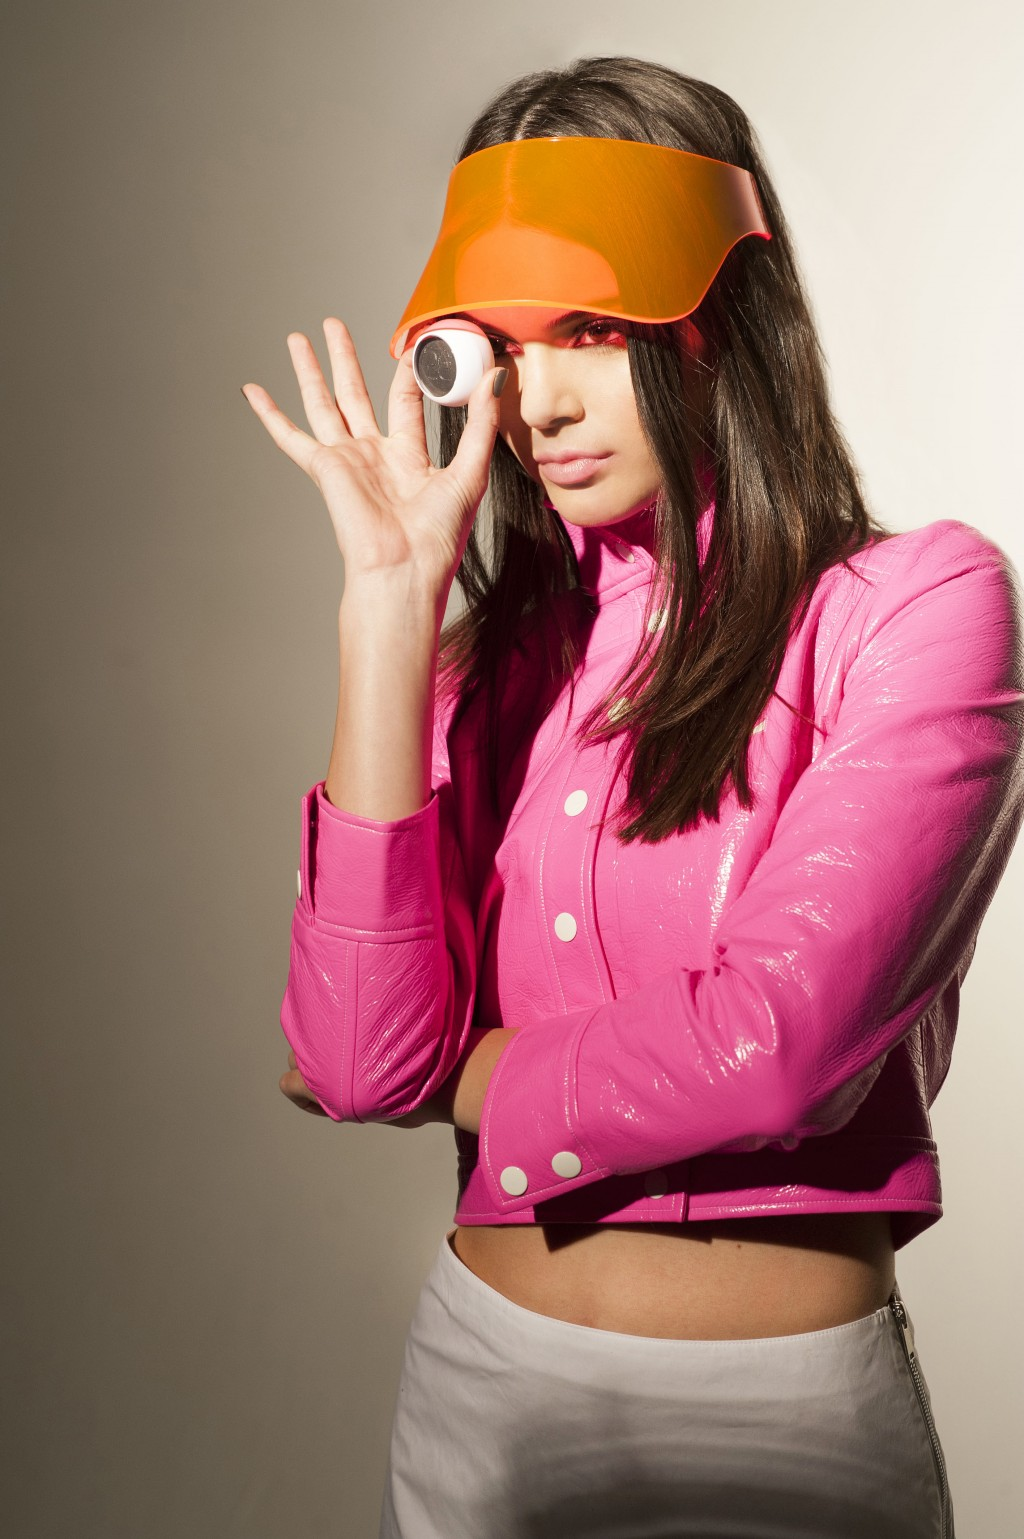 Joue là comme Kendall Jenner